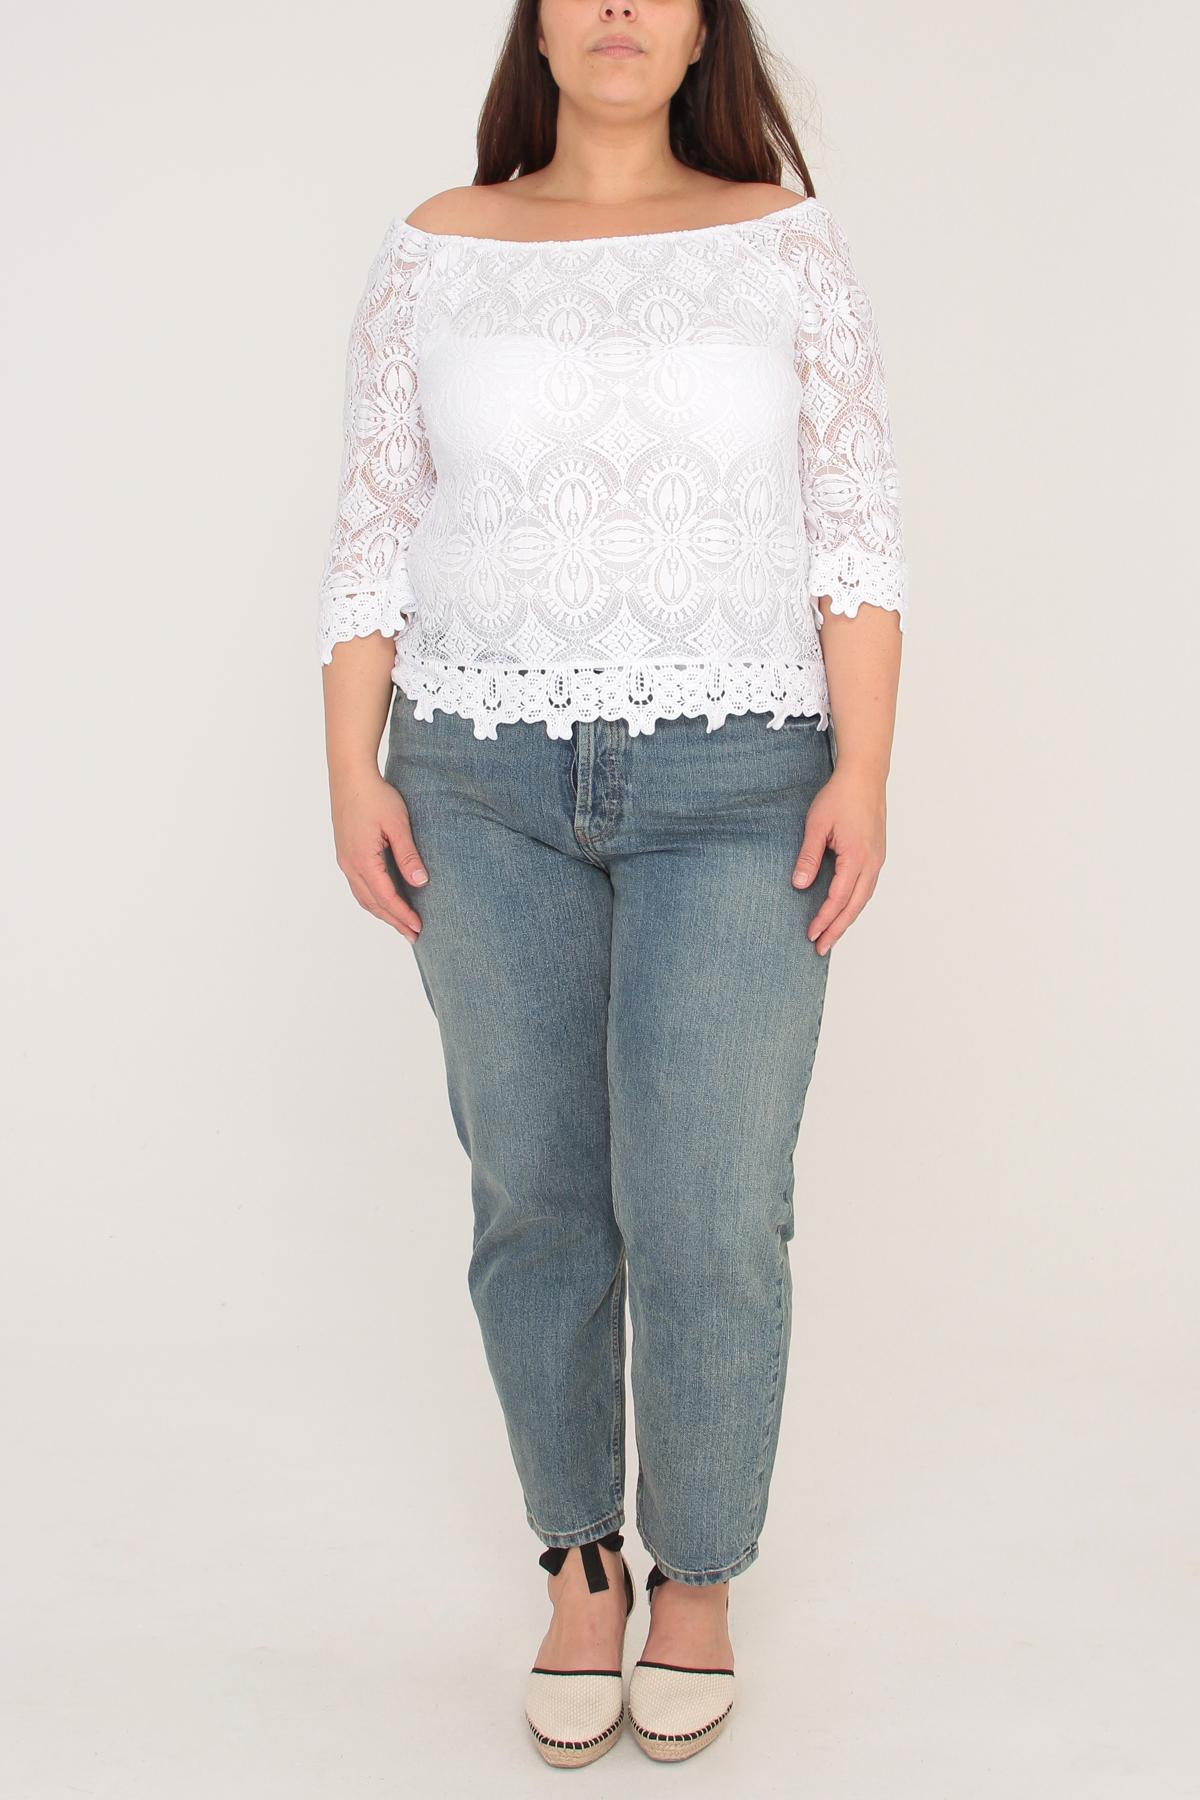 T-shirts Femme Blanc VETI STYLE 91002 #c eFashion Paris